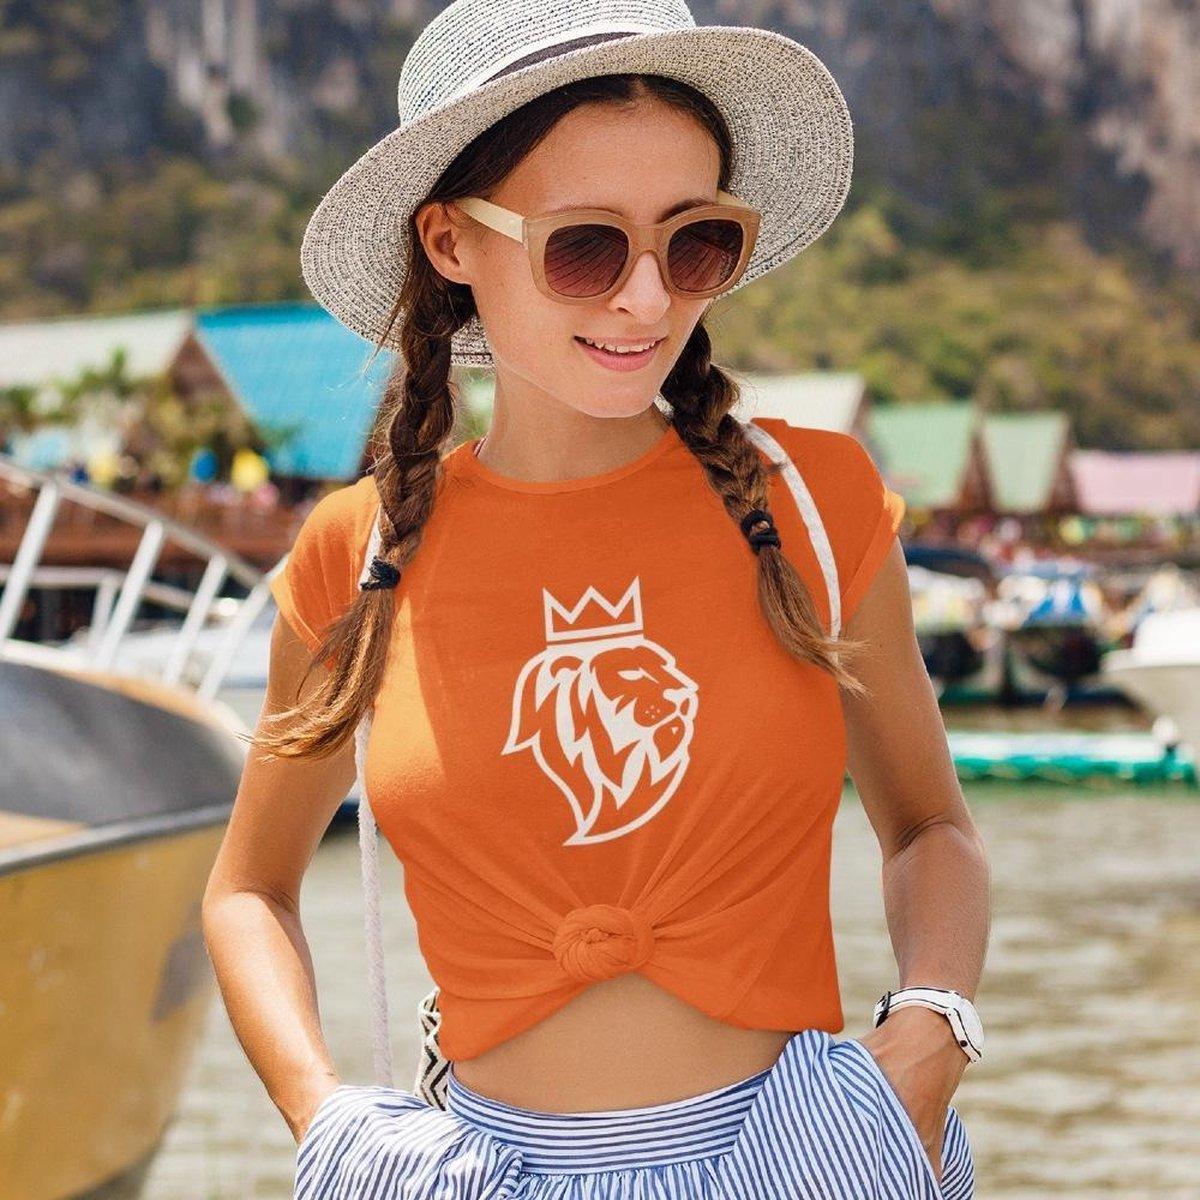 EK WK & Koningsdag T-Shirt De Leeuw (DAMES - MAAT S)   Oranje Kleding   Feestkleding